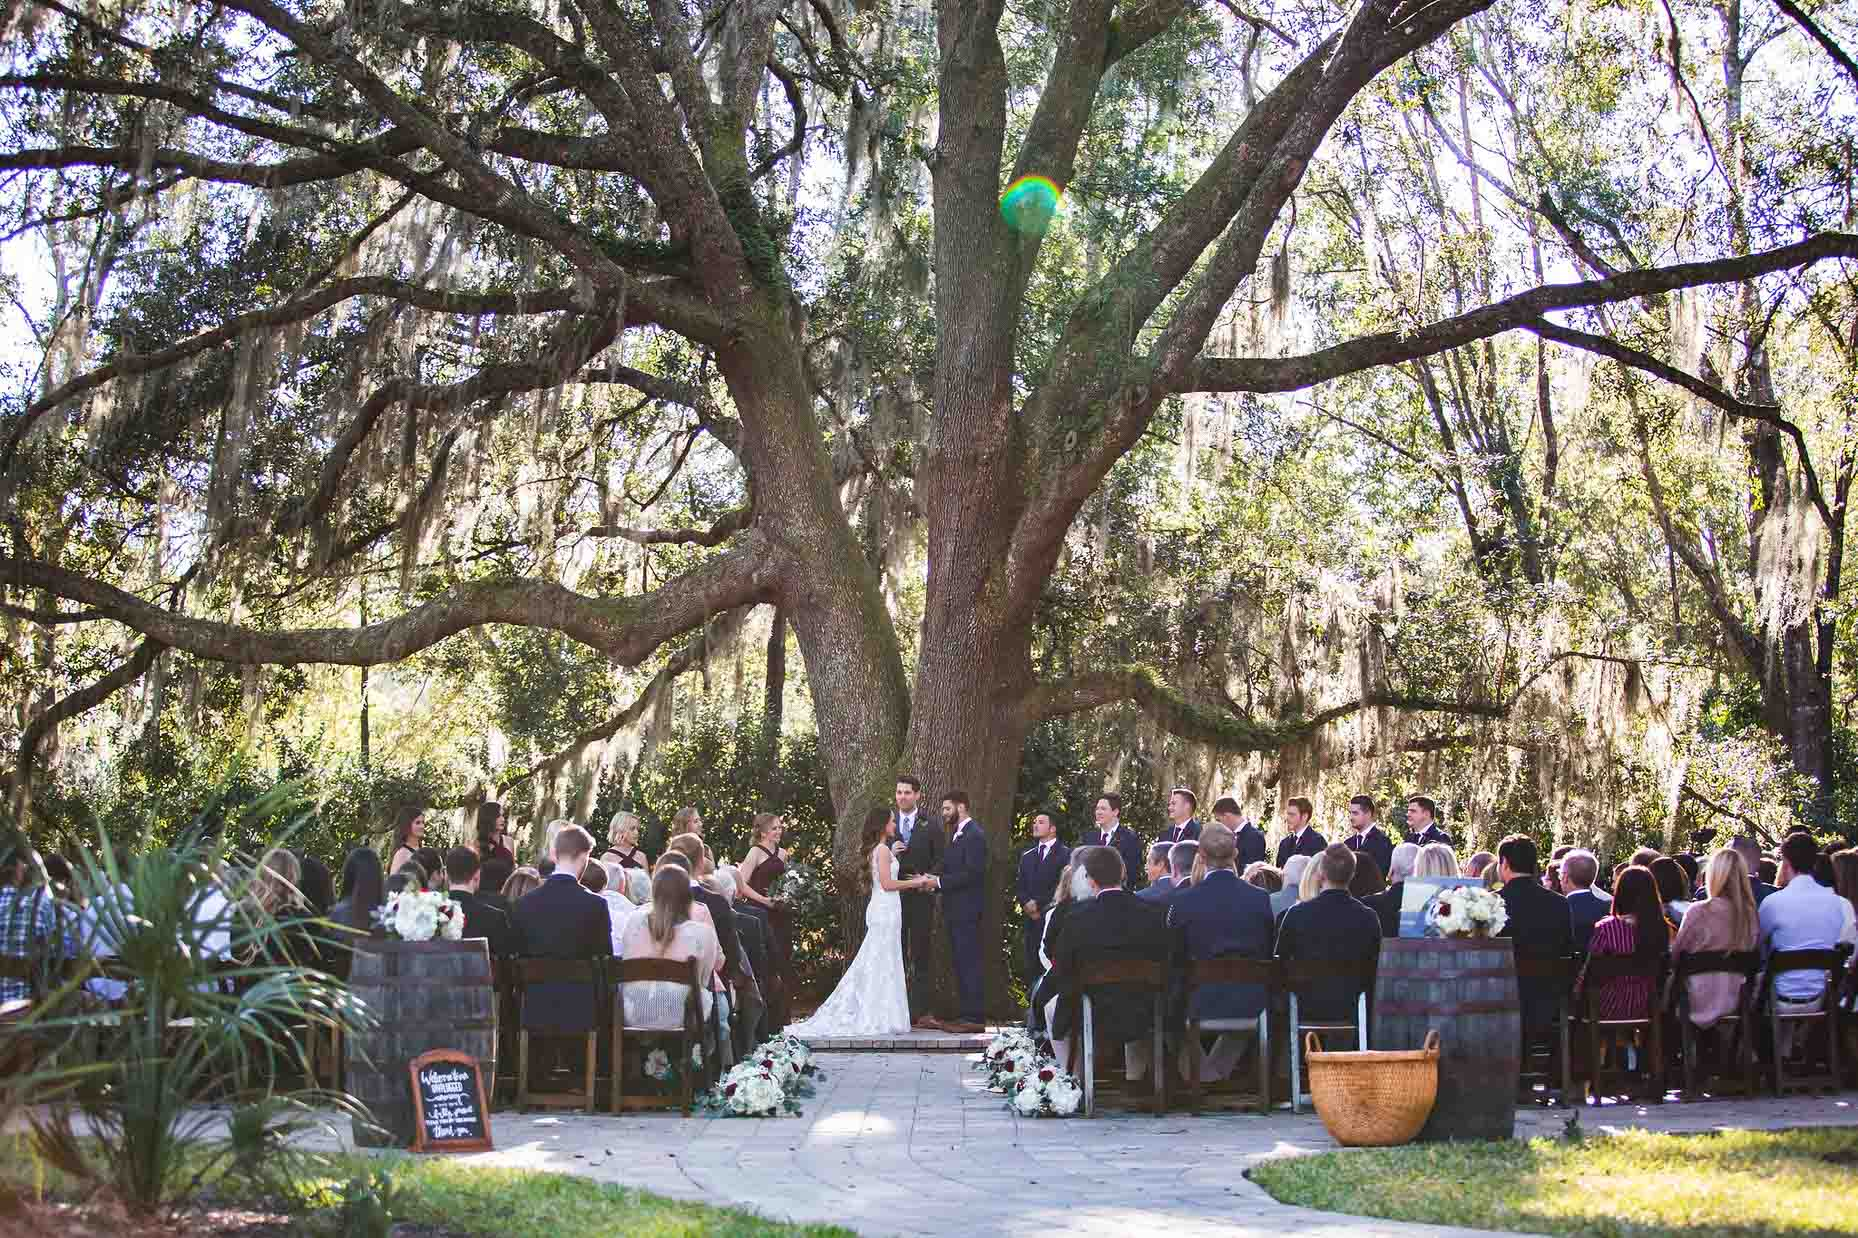 adam-szarmack-bowing-oaks-wedding-photographer-jacksonville-76.jpg